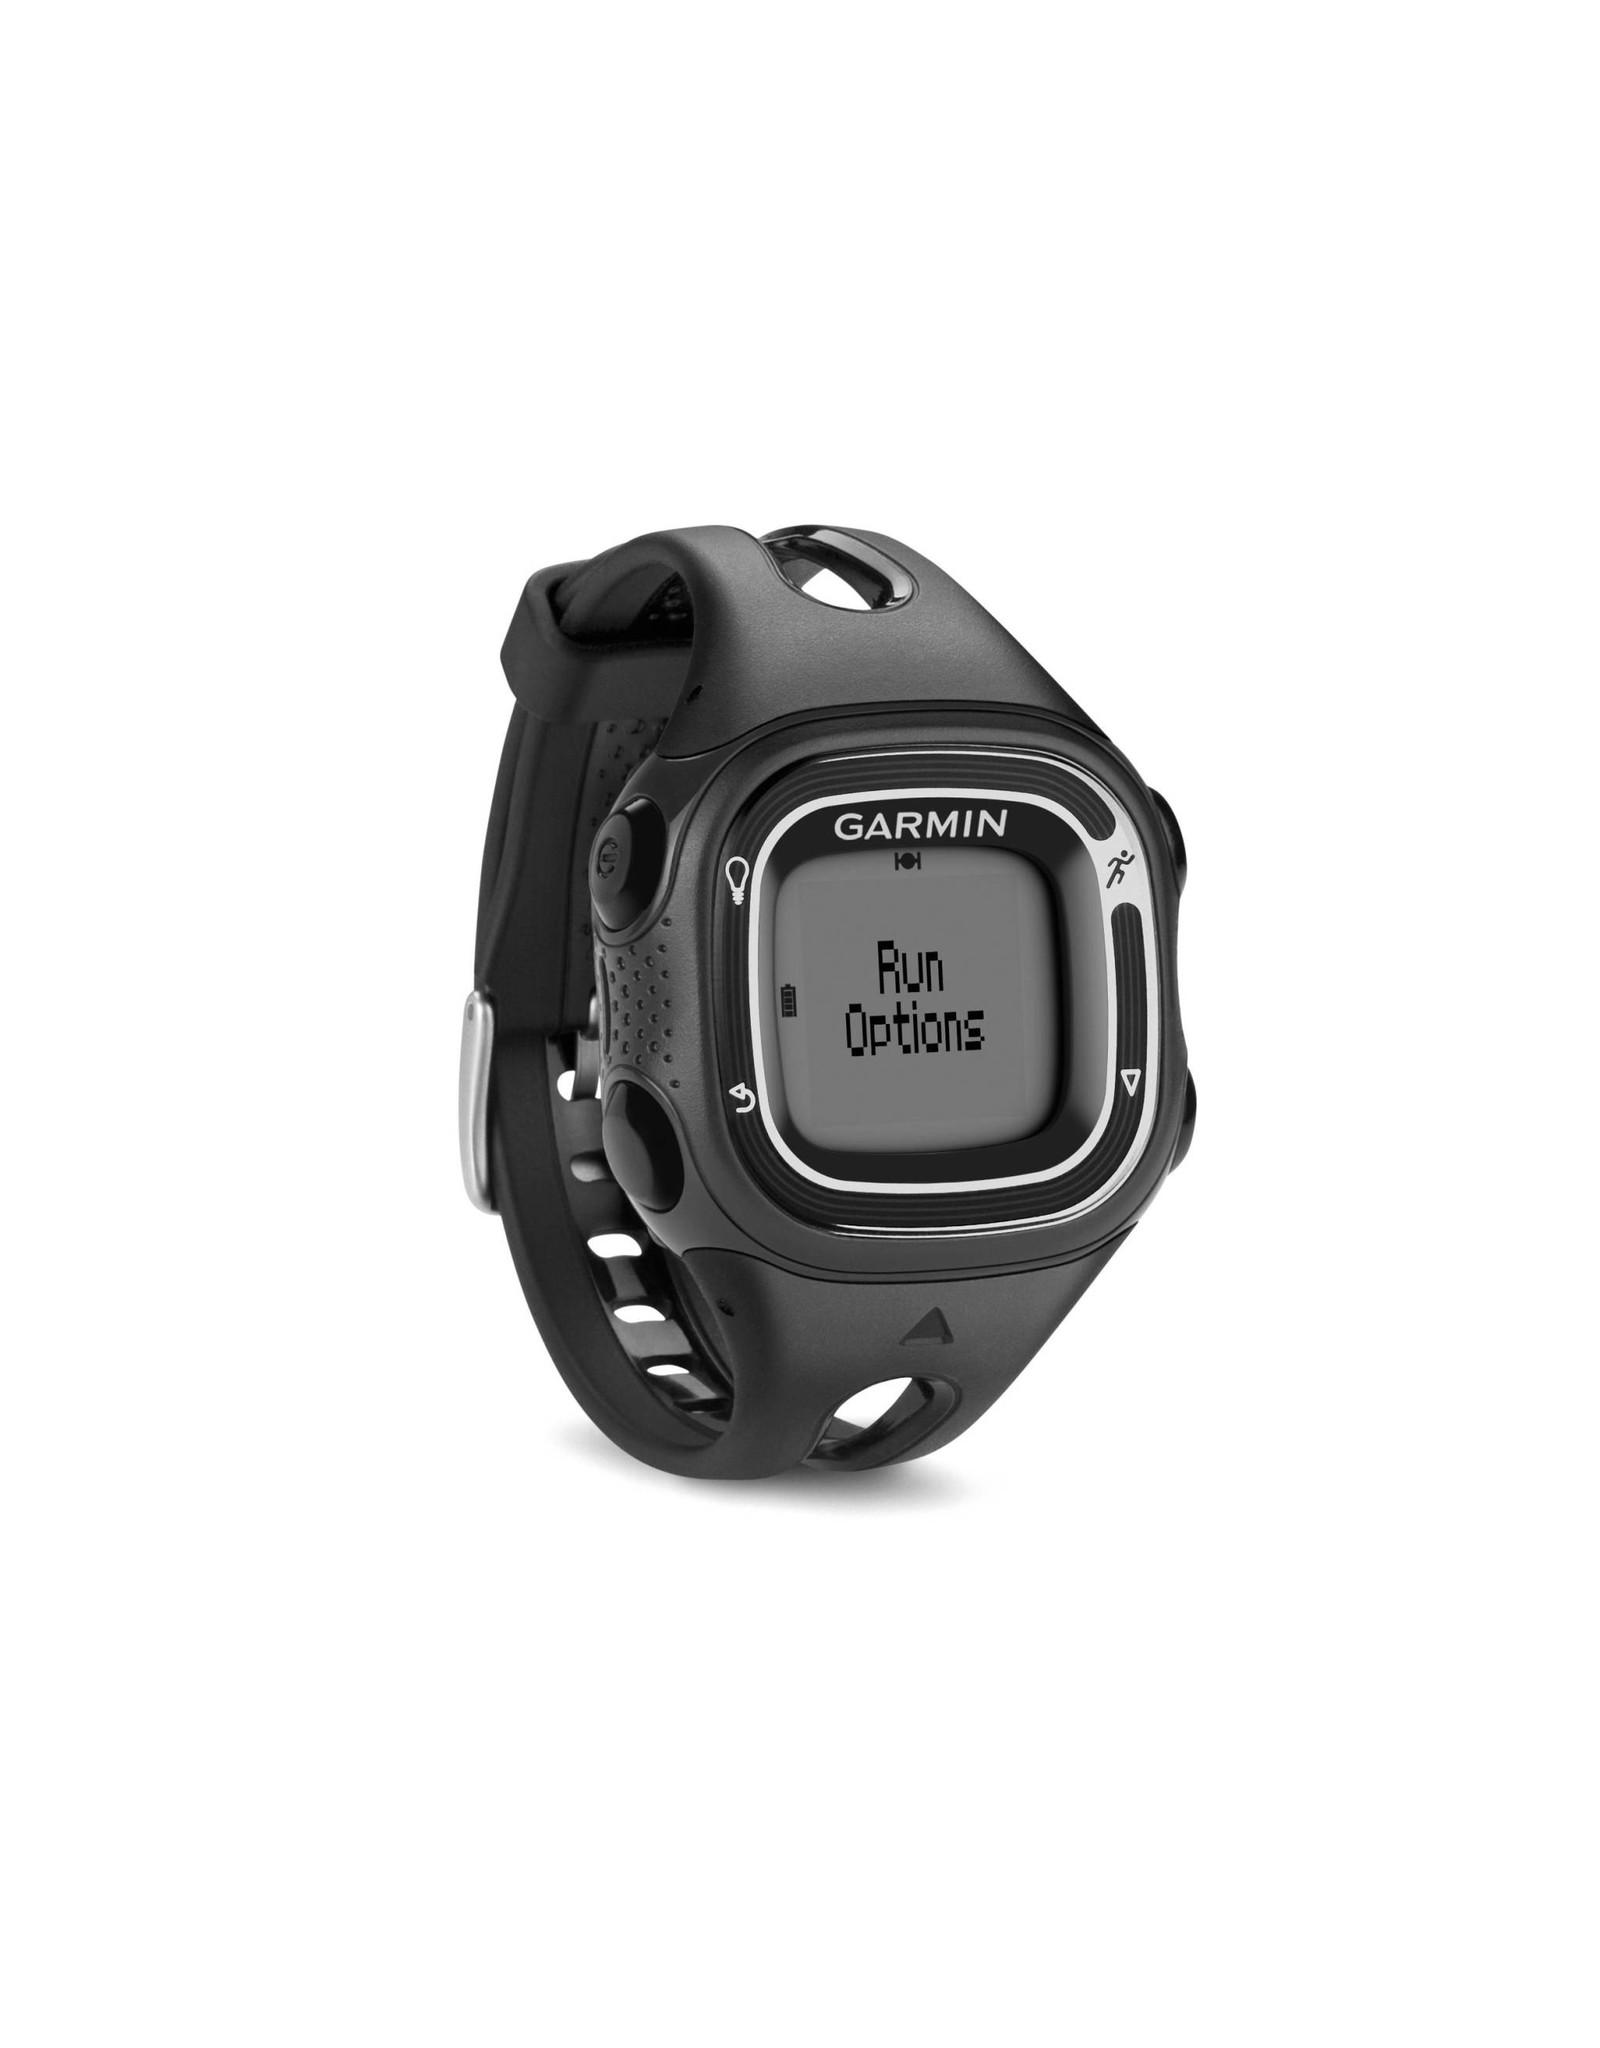 GARMIN Forerunner 10 GPS Watch (New Old Stock)